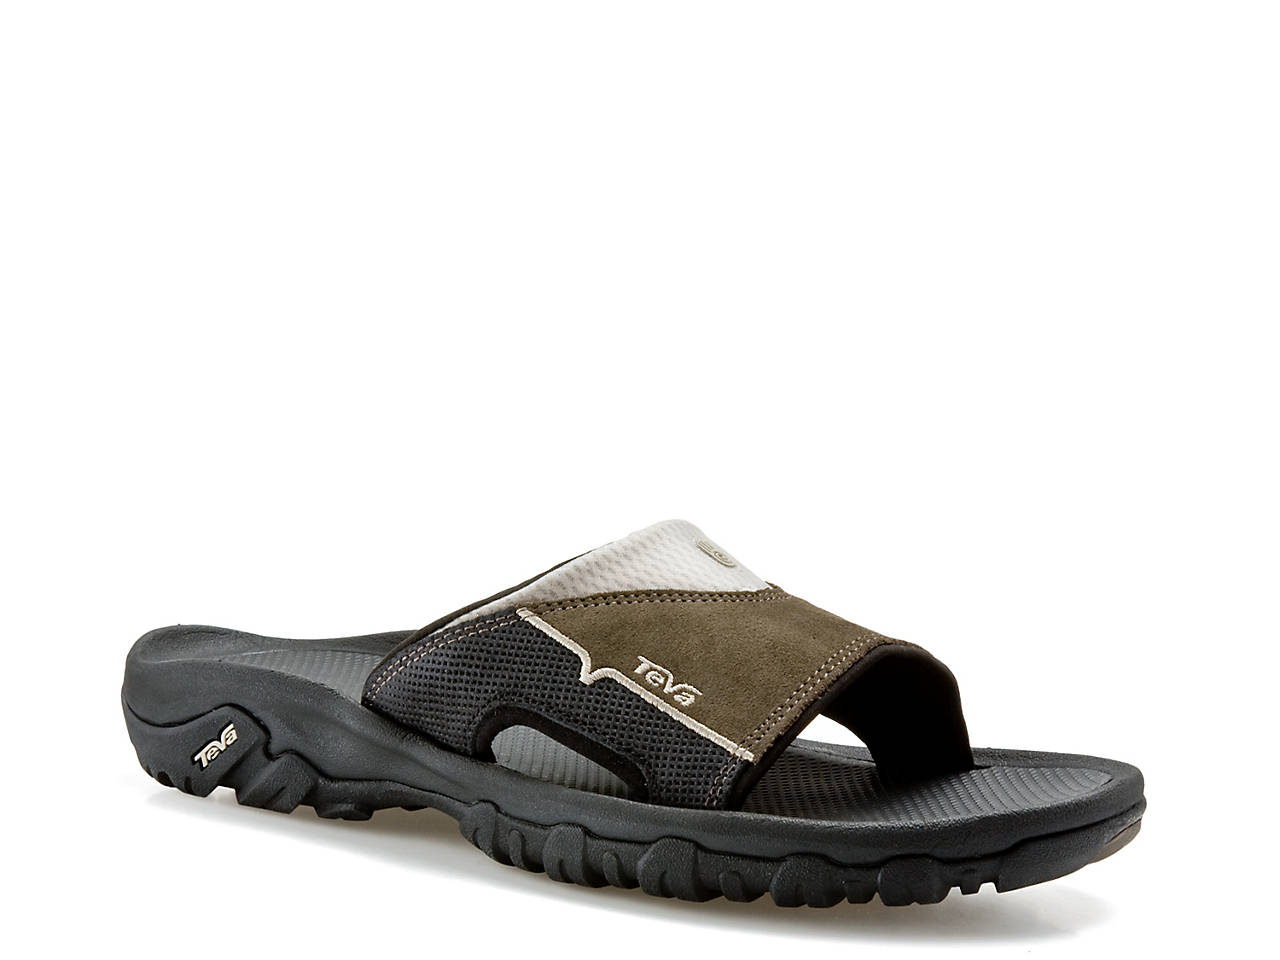 42ca16826 Teva Katavi Slide Sandal Men s Shoes